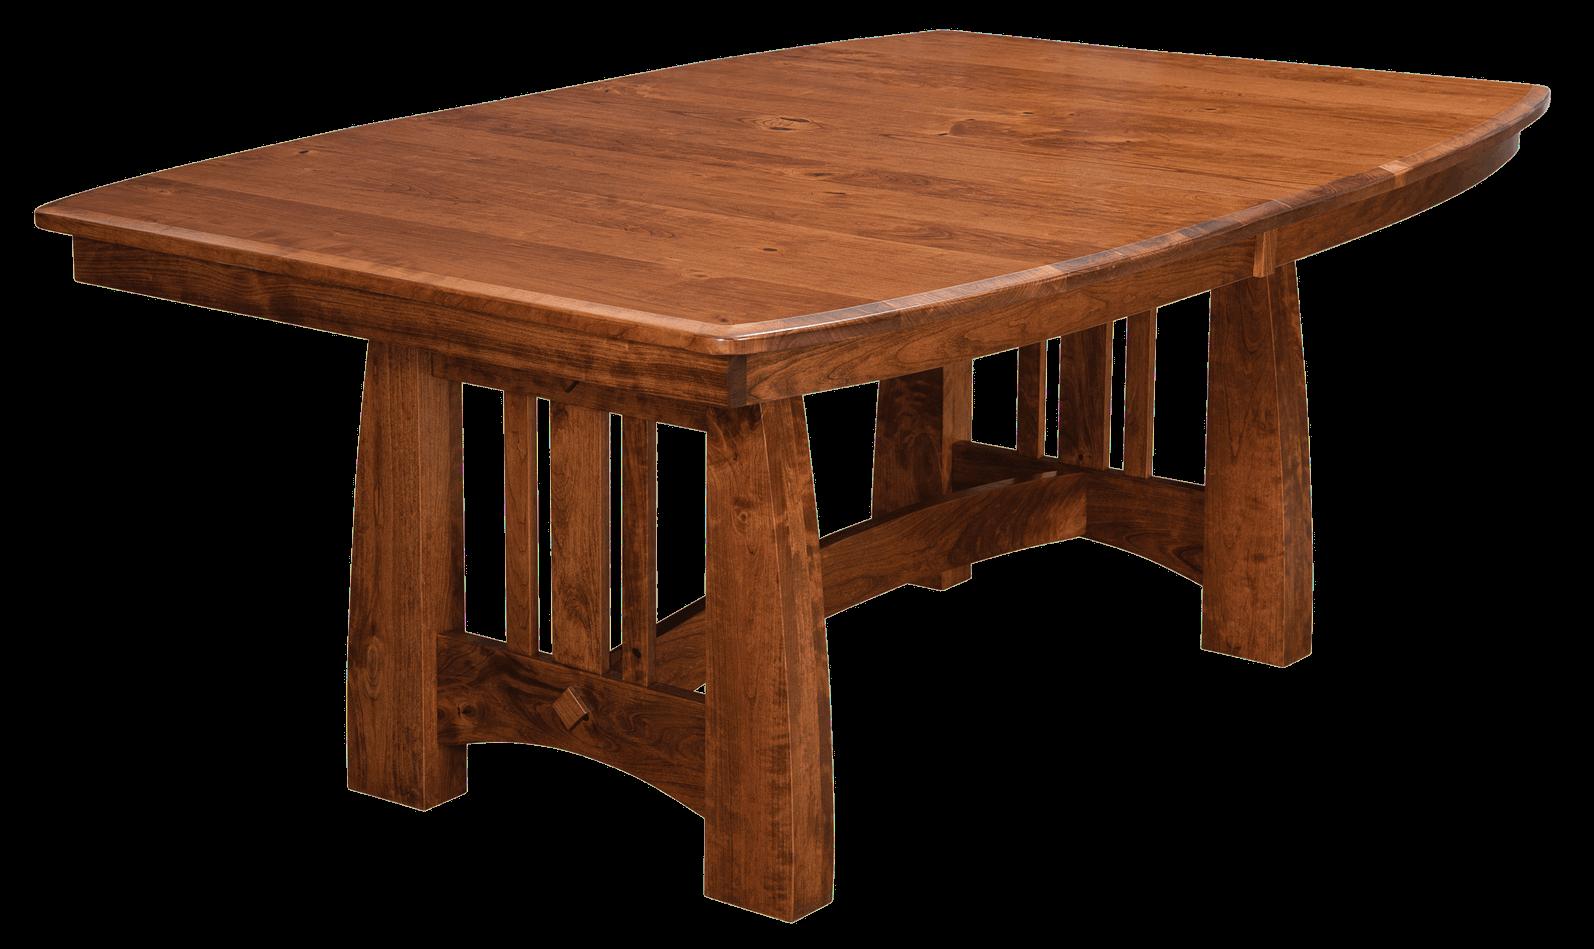 Fairview Woodworking - Shipshewana, IN